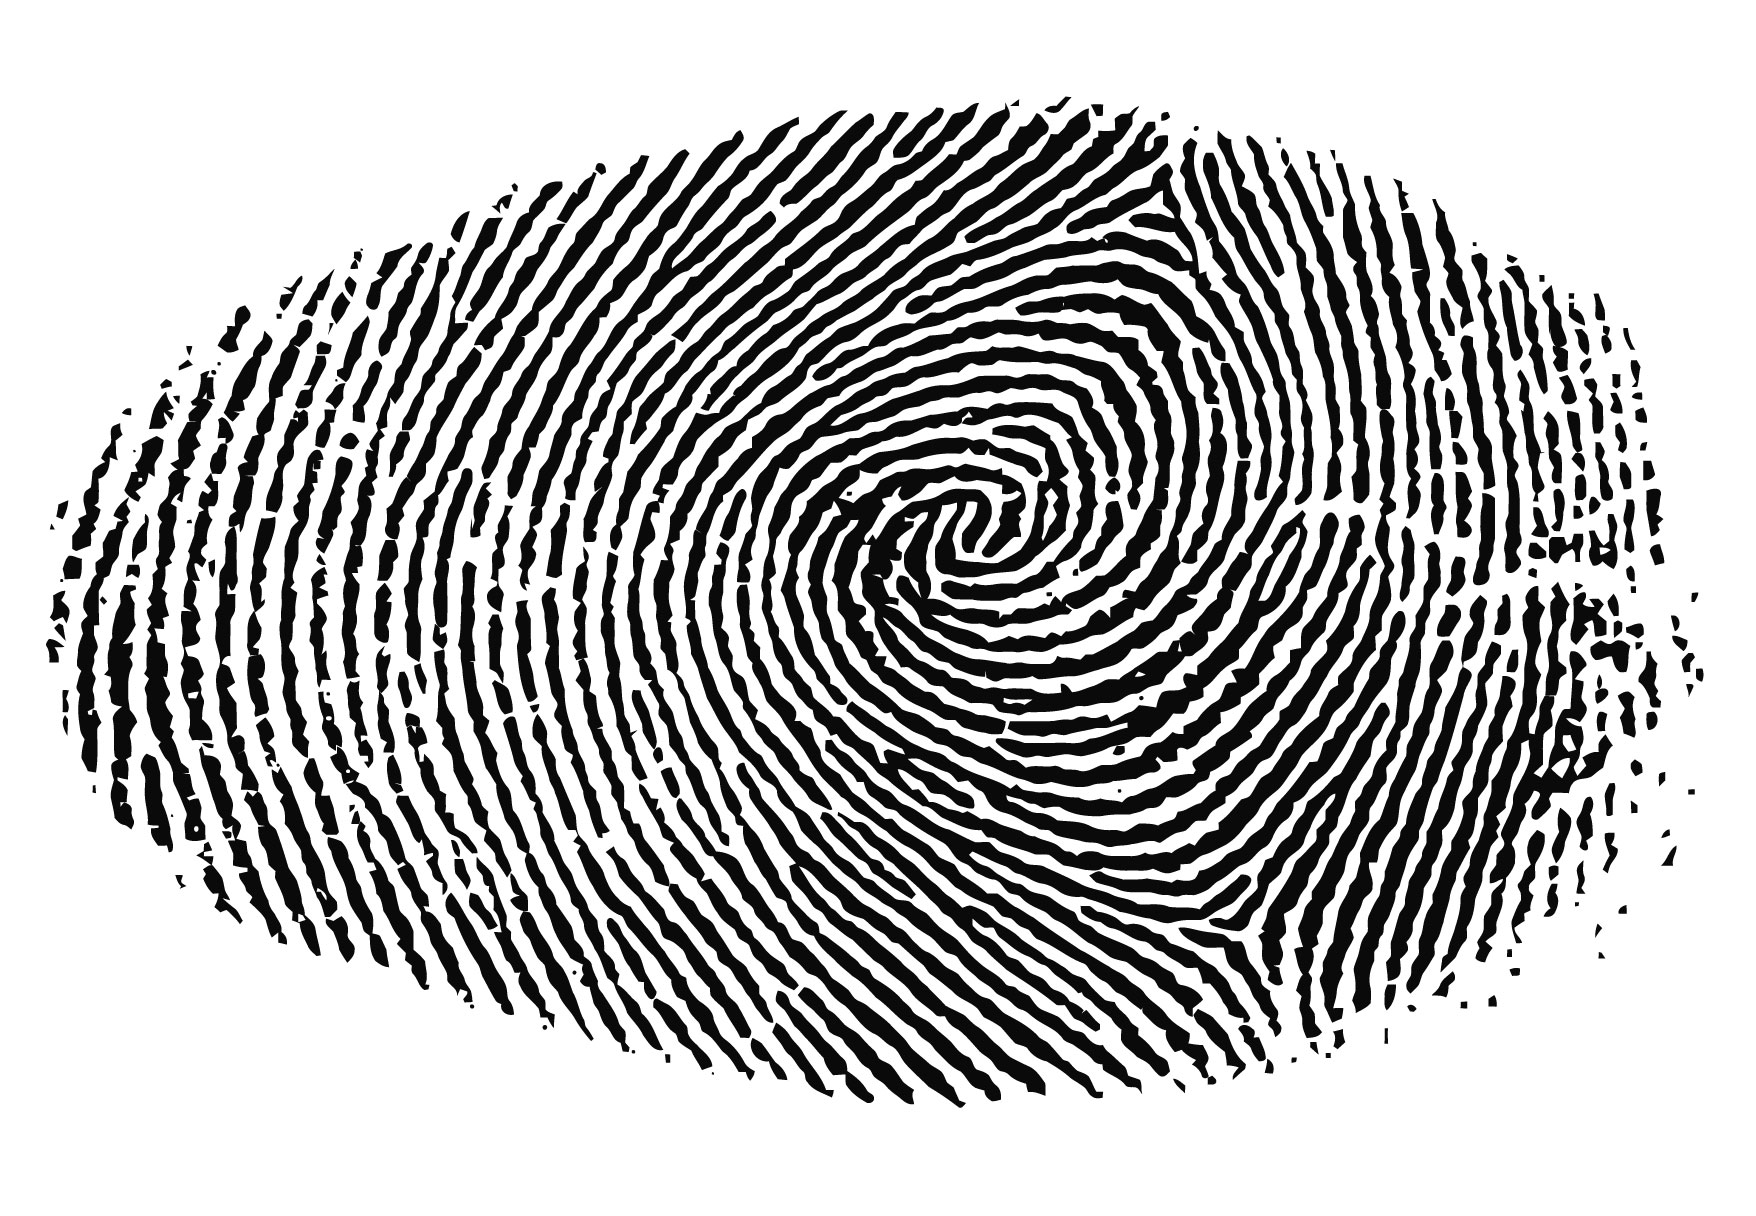 13 Fingerprint Vector Art Images